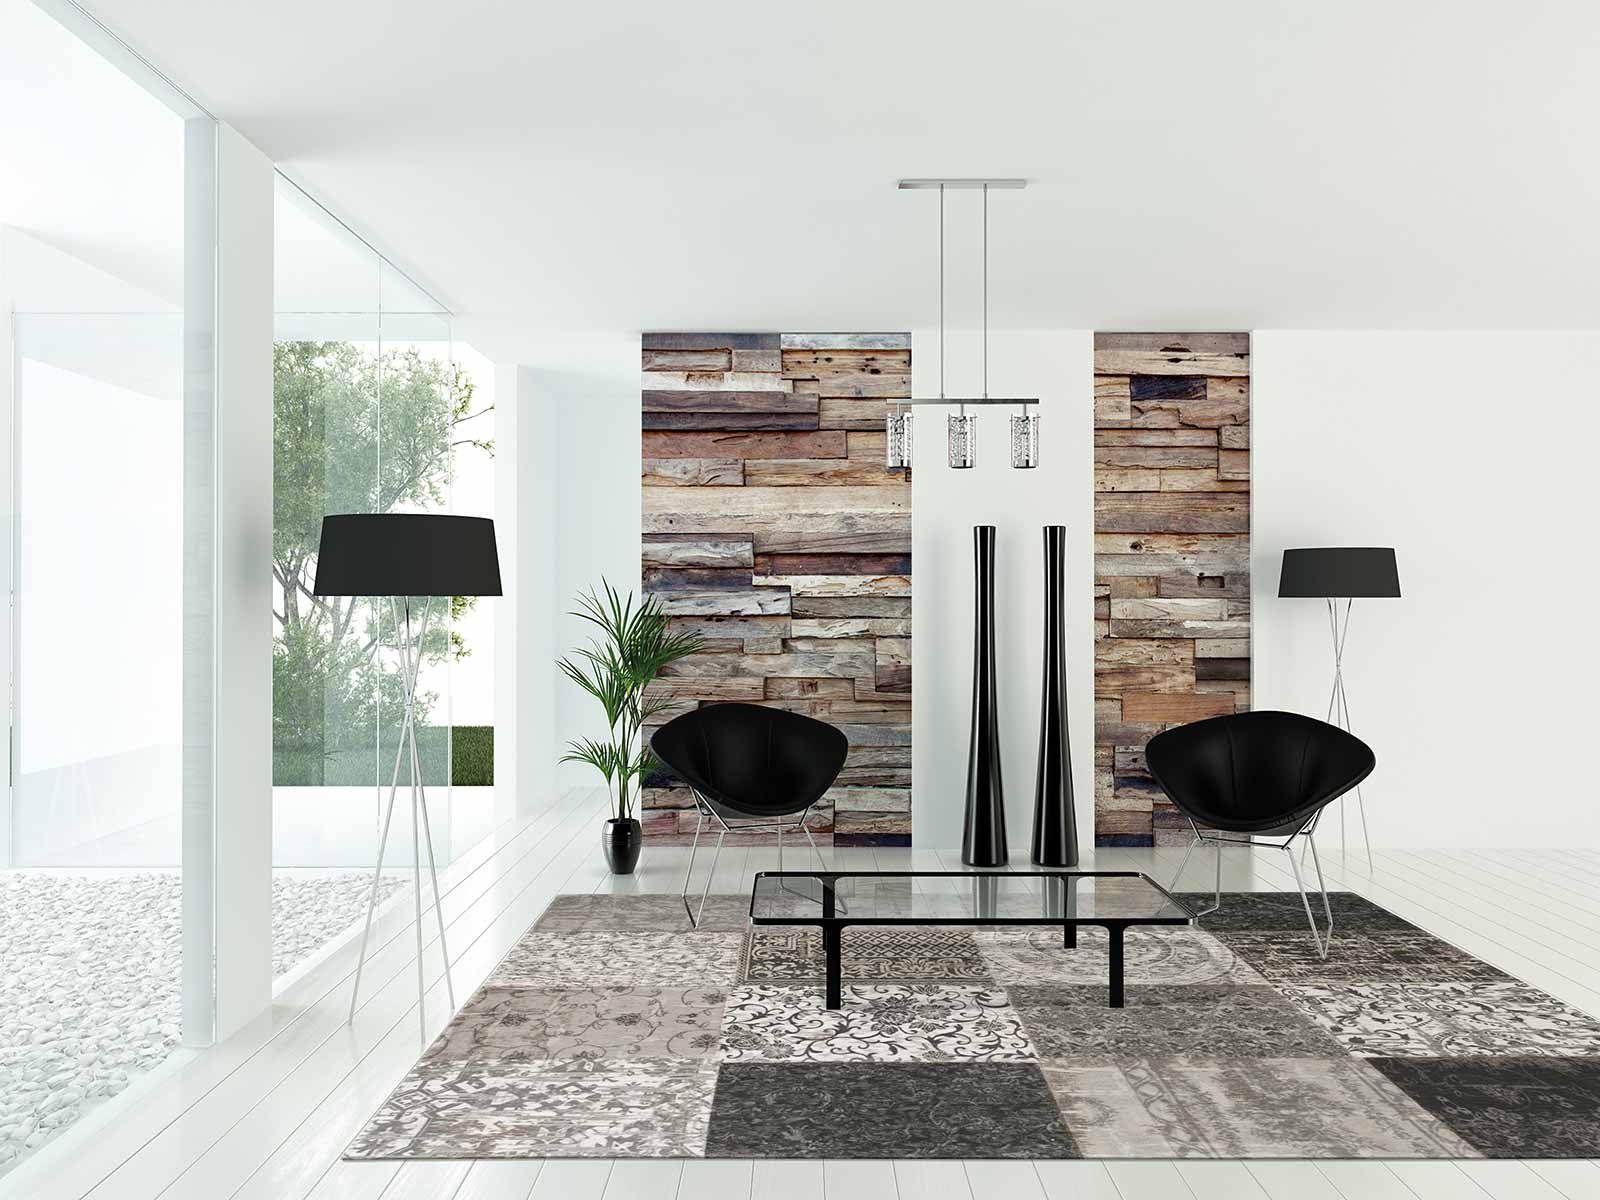 tapijt Louis De Poortere LX8101 Vintage Black White interior 2